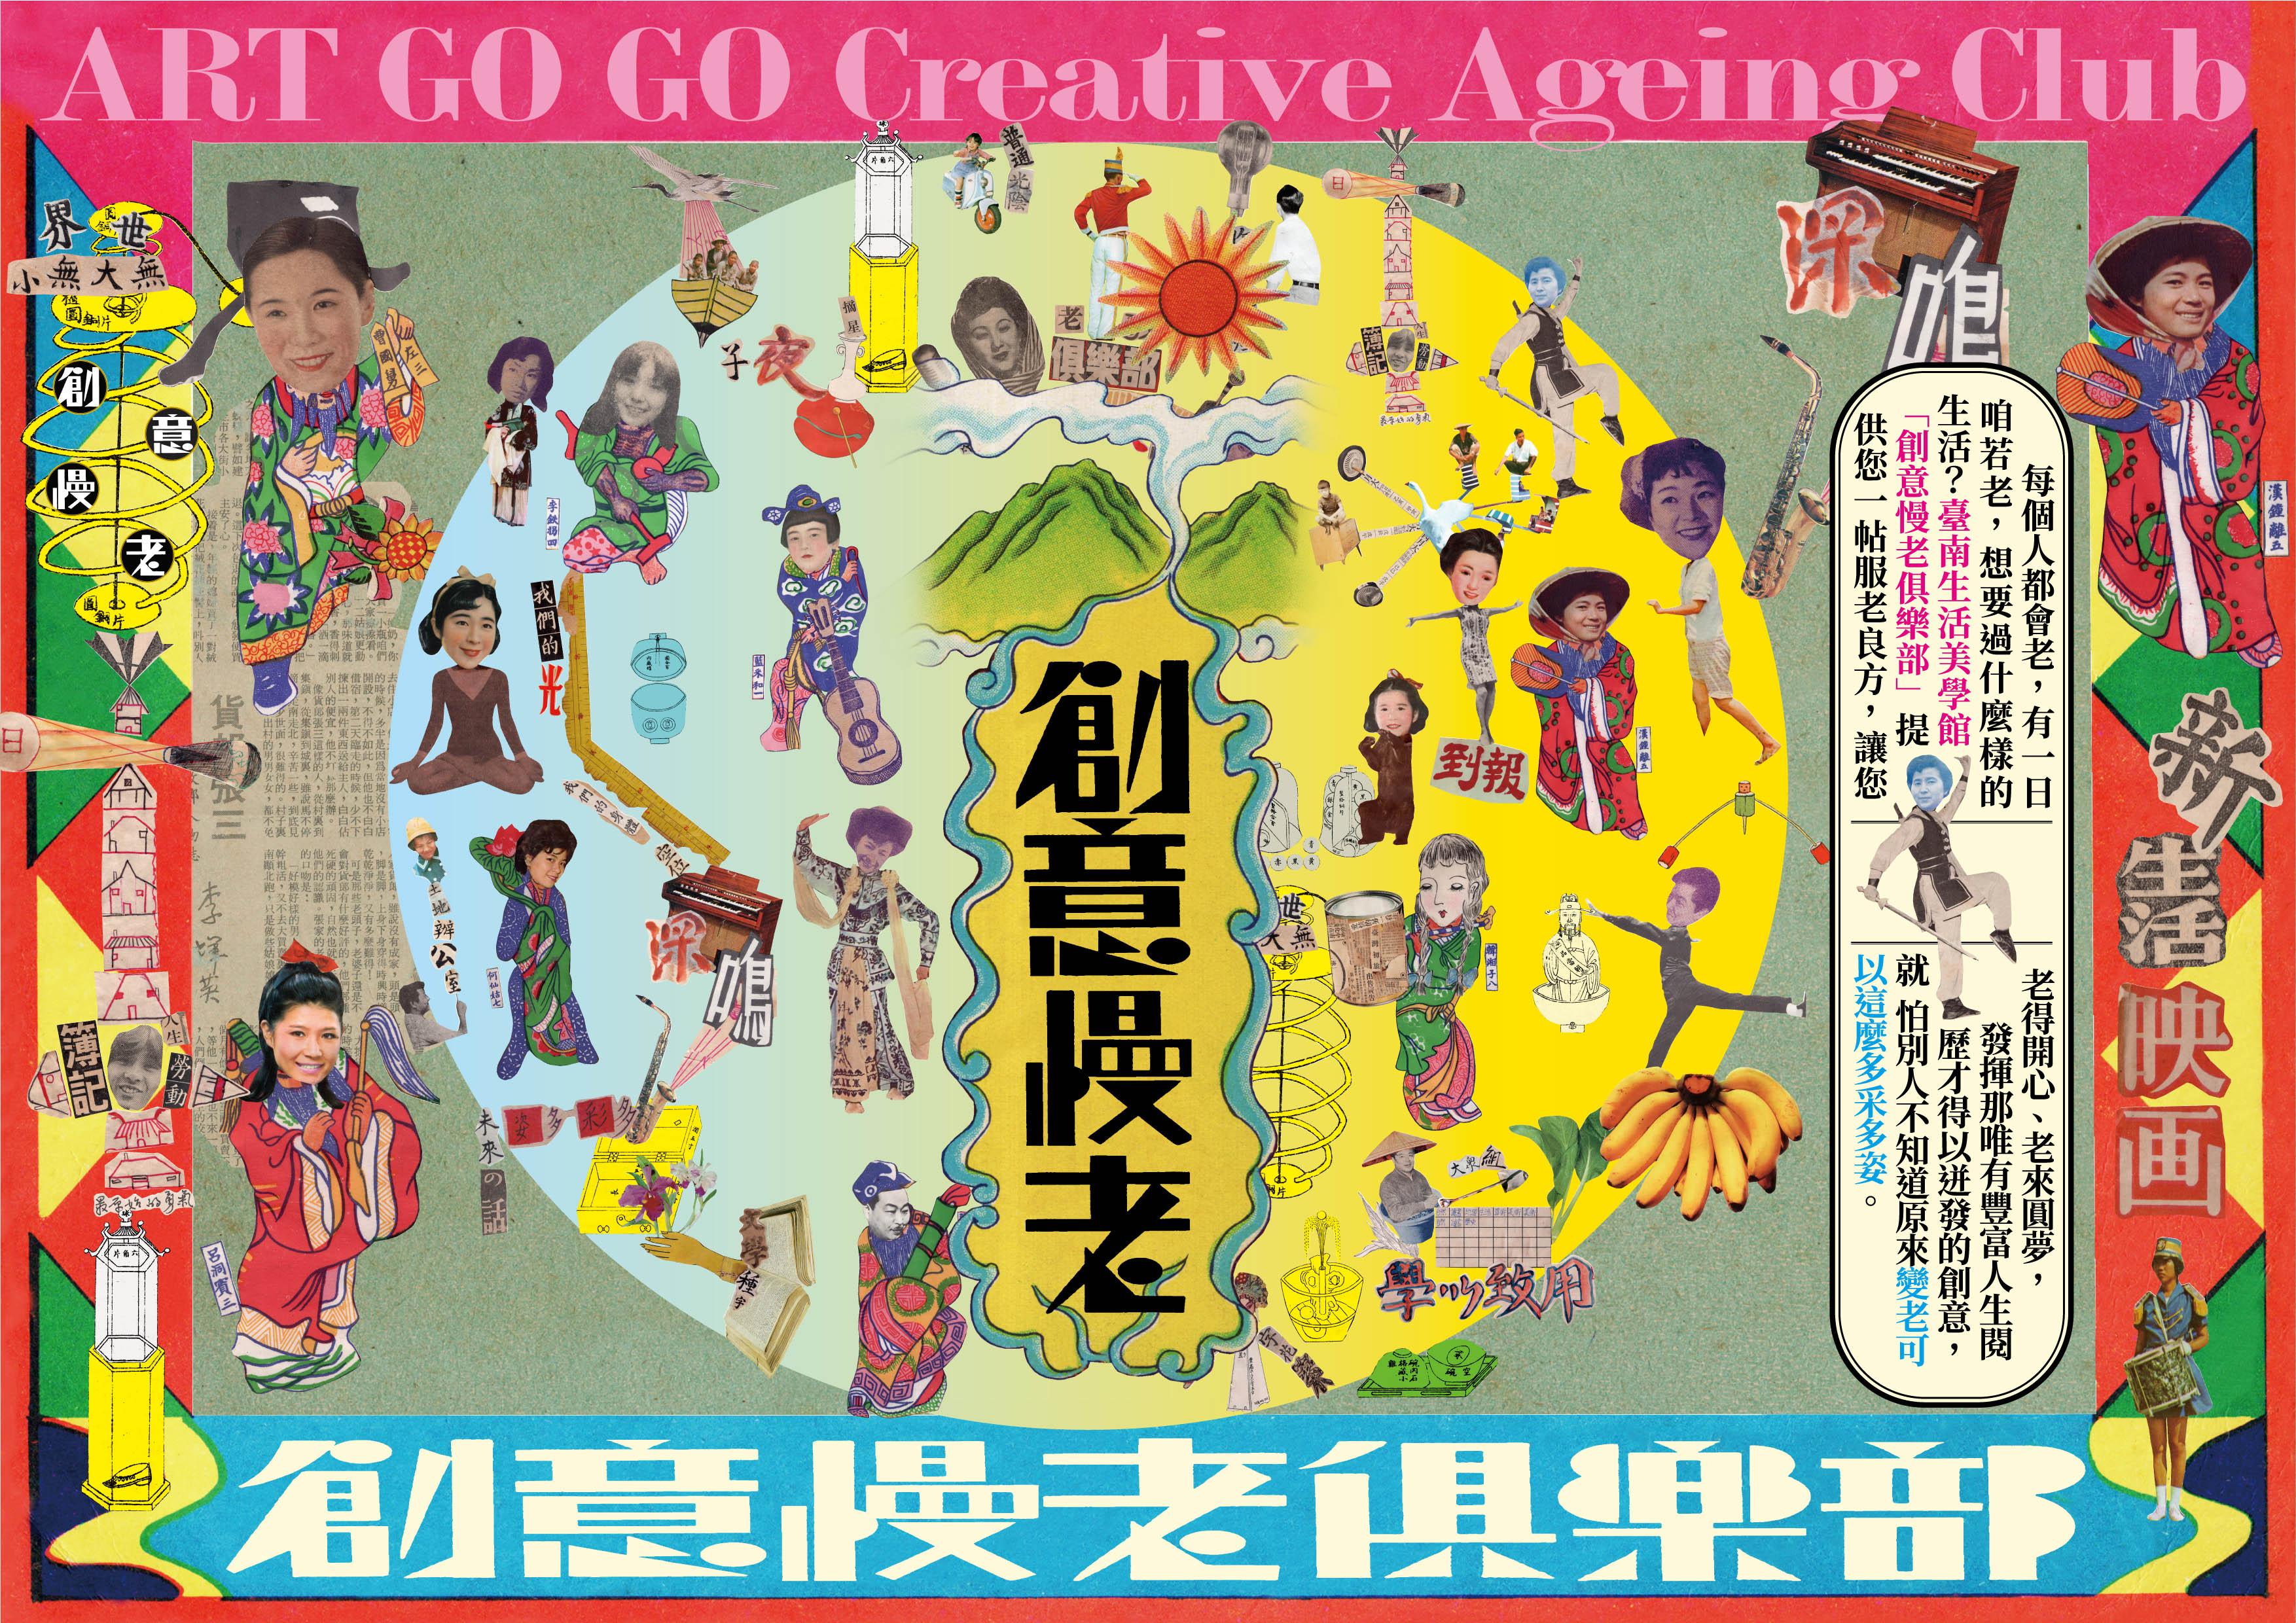 創意慢老俱樂部 ART GO GO Creative Ageing Club